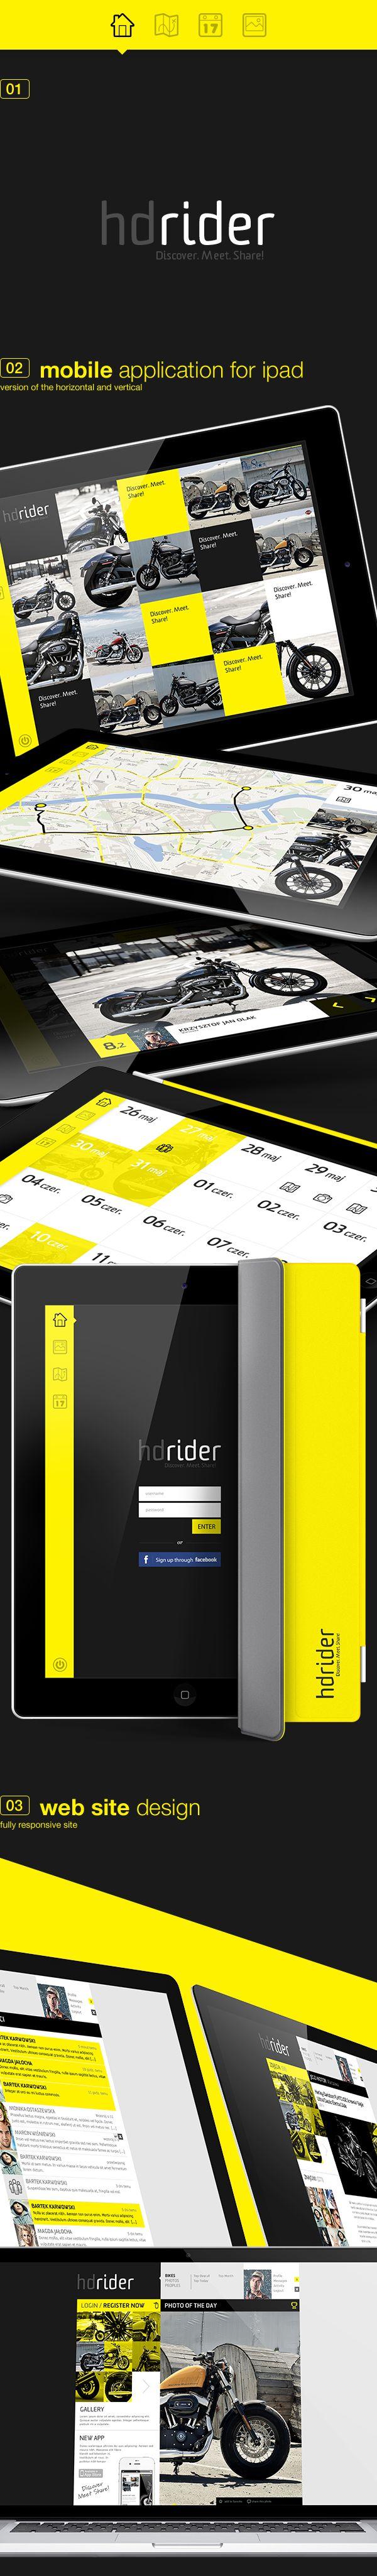 hdrider, app & web via Behance #ProntoDigital #WebDesign